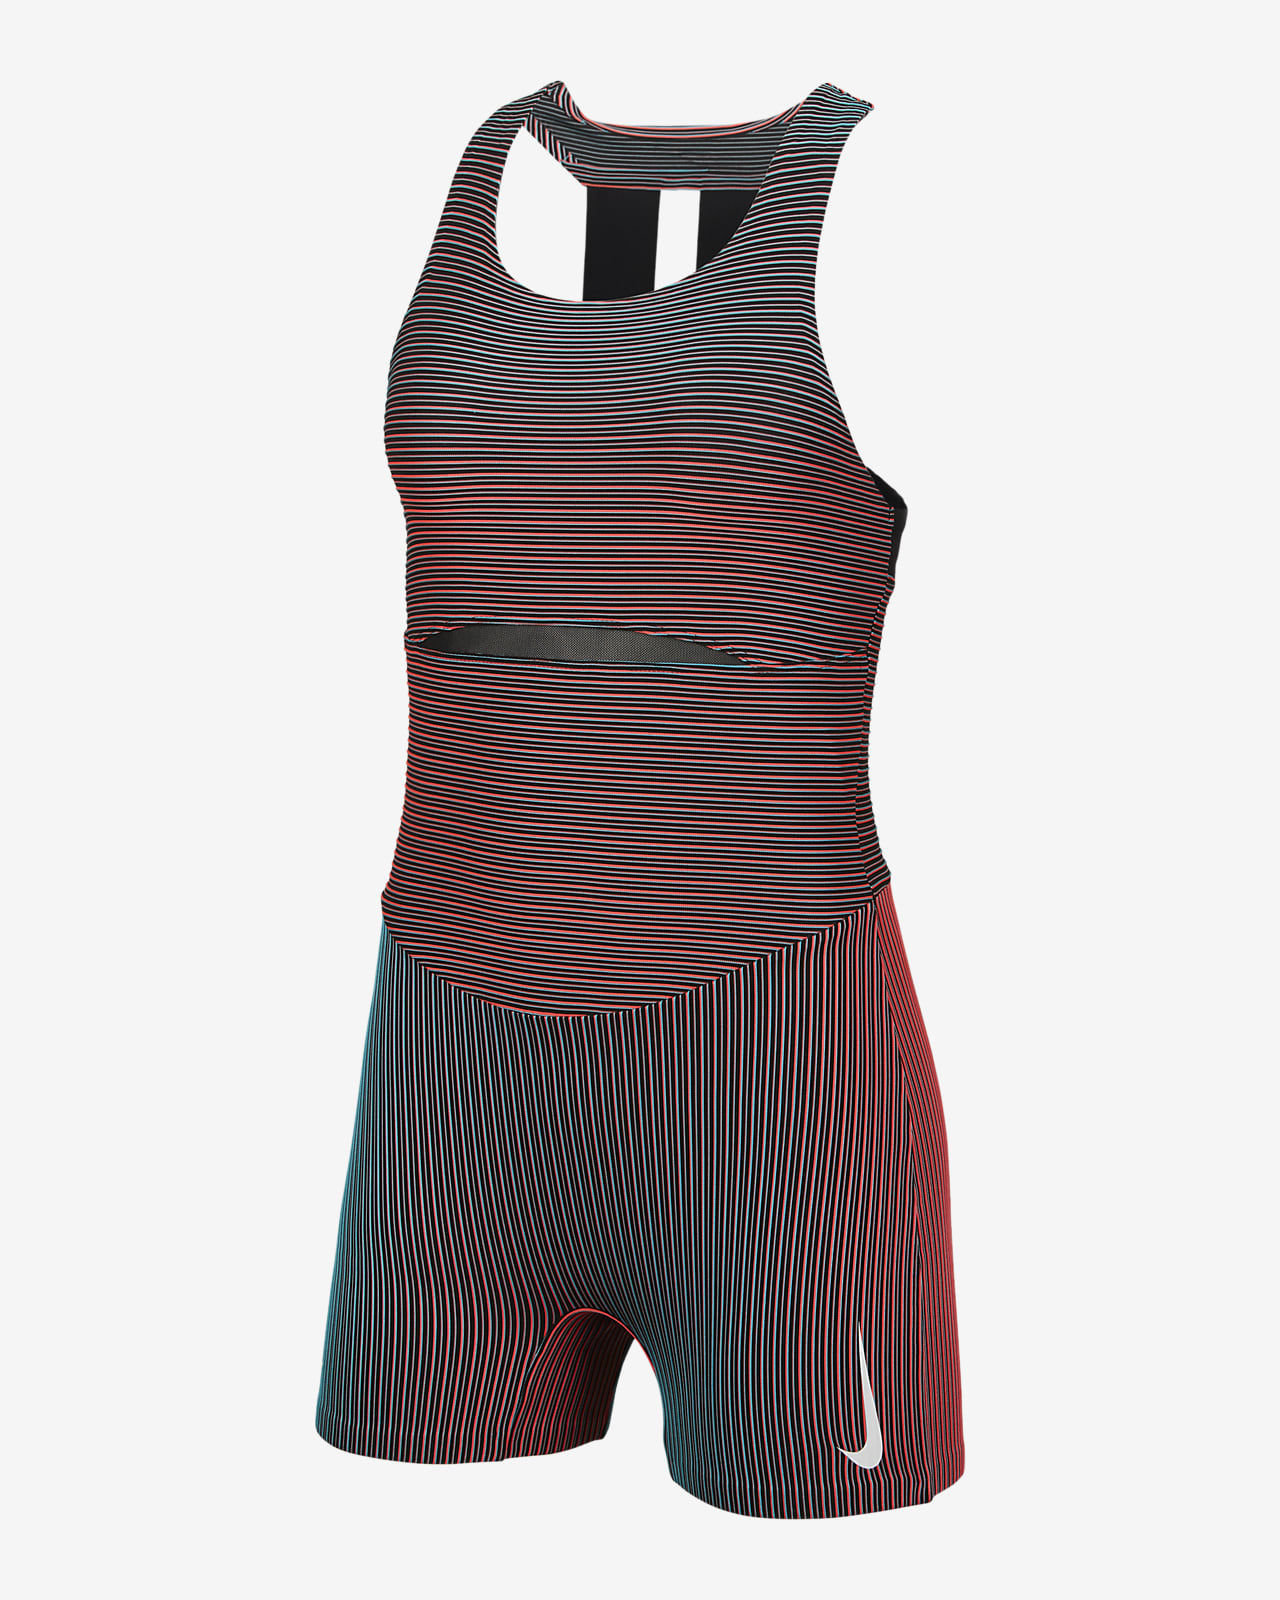 Nike 女子跑步紧身连体衣